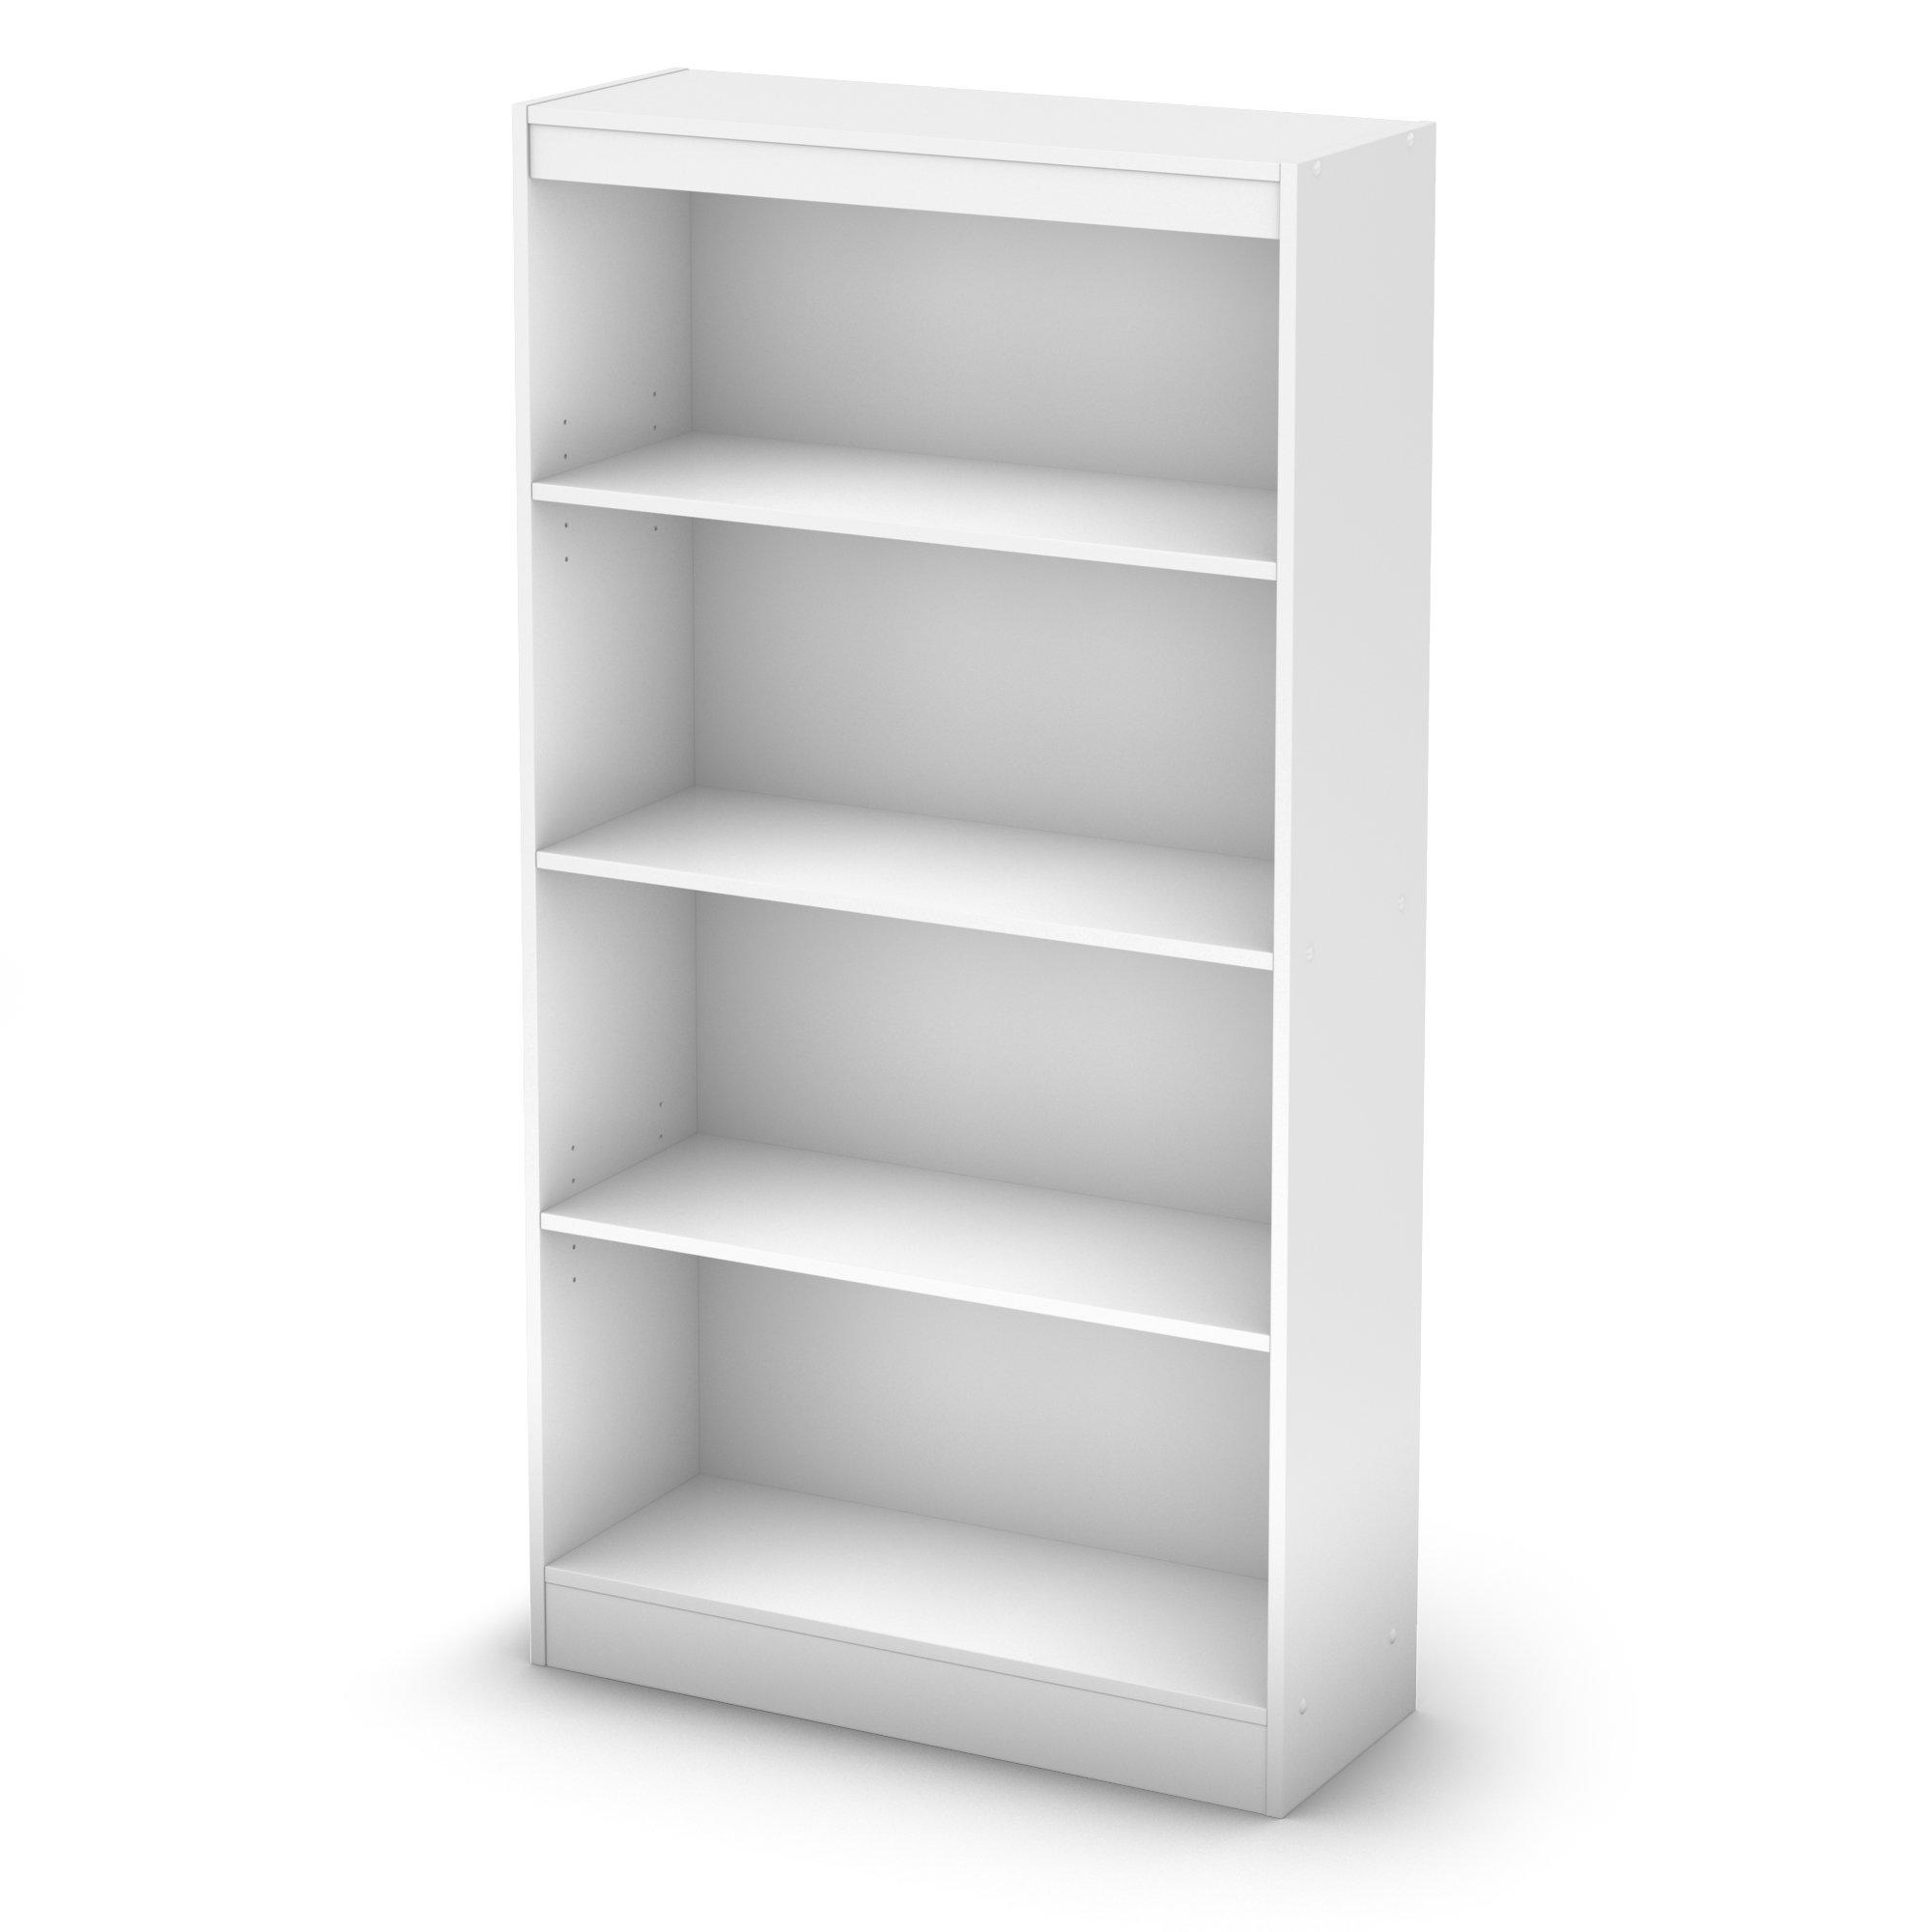 South Shore 4-Shelf Storage Bookcase, Pure White by South Shore